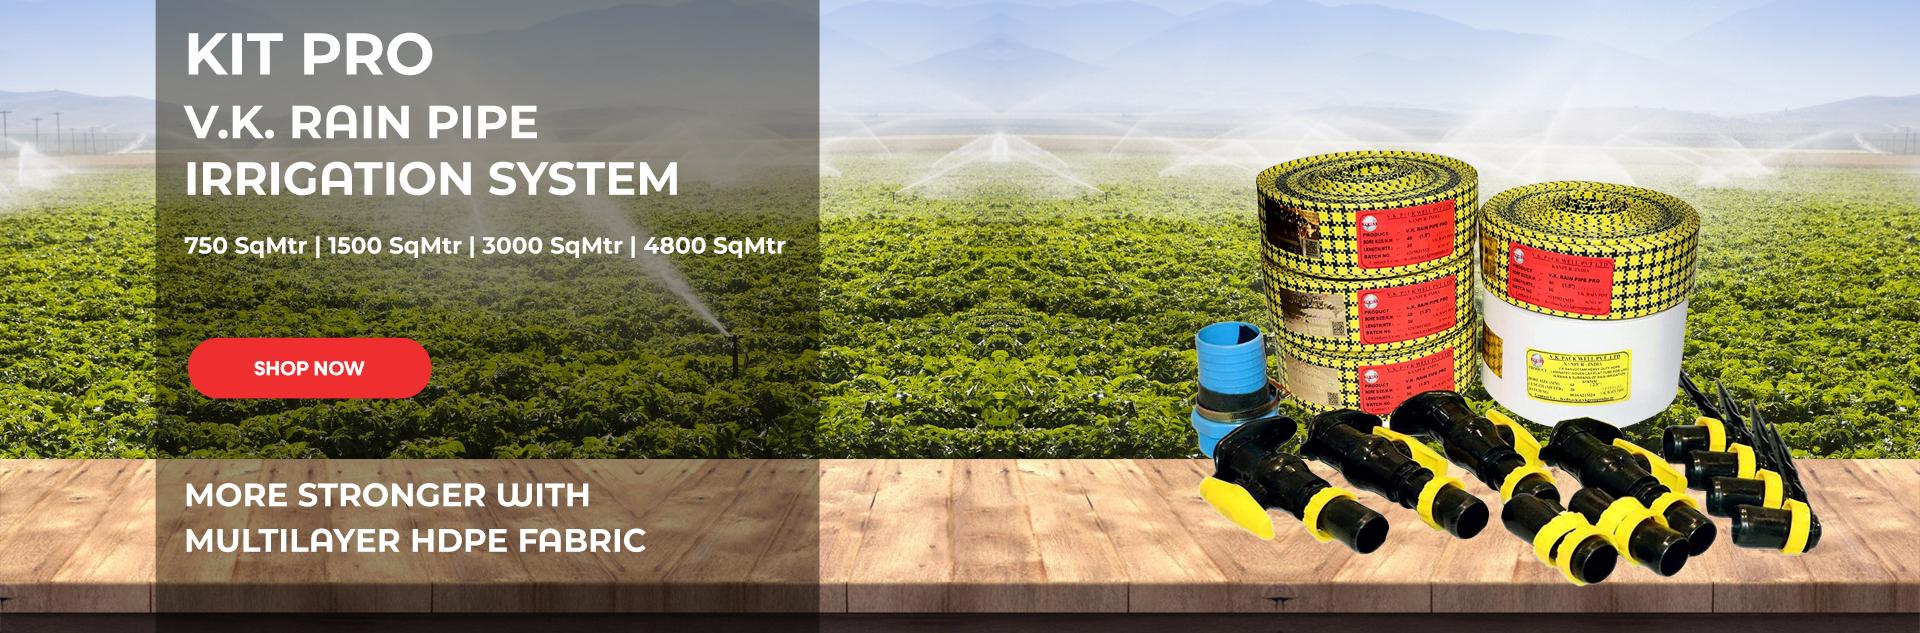 V.K. Rain Pipe Irrigation System PRO